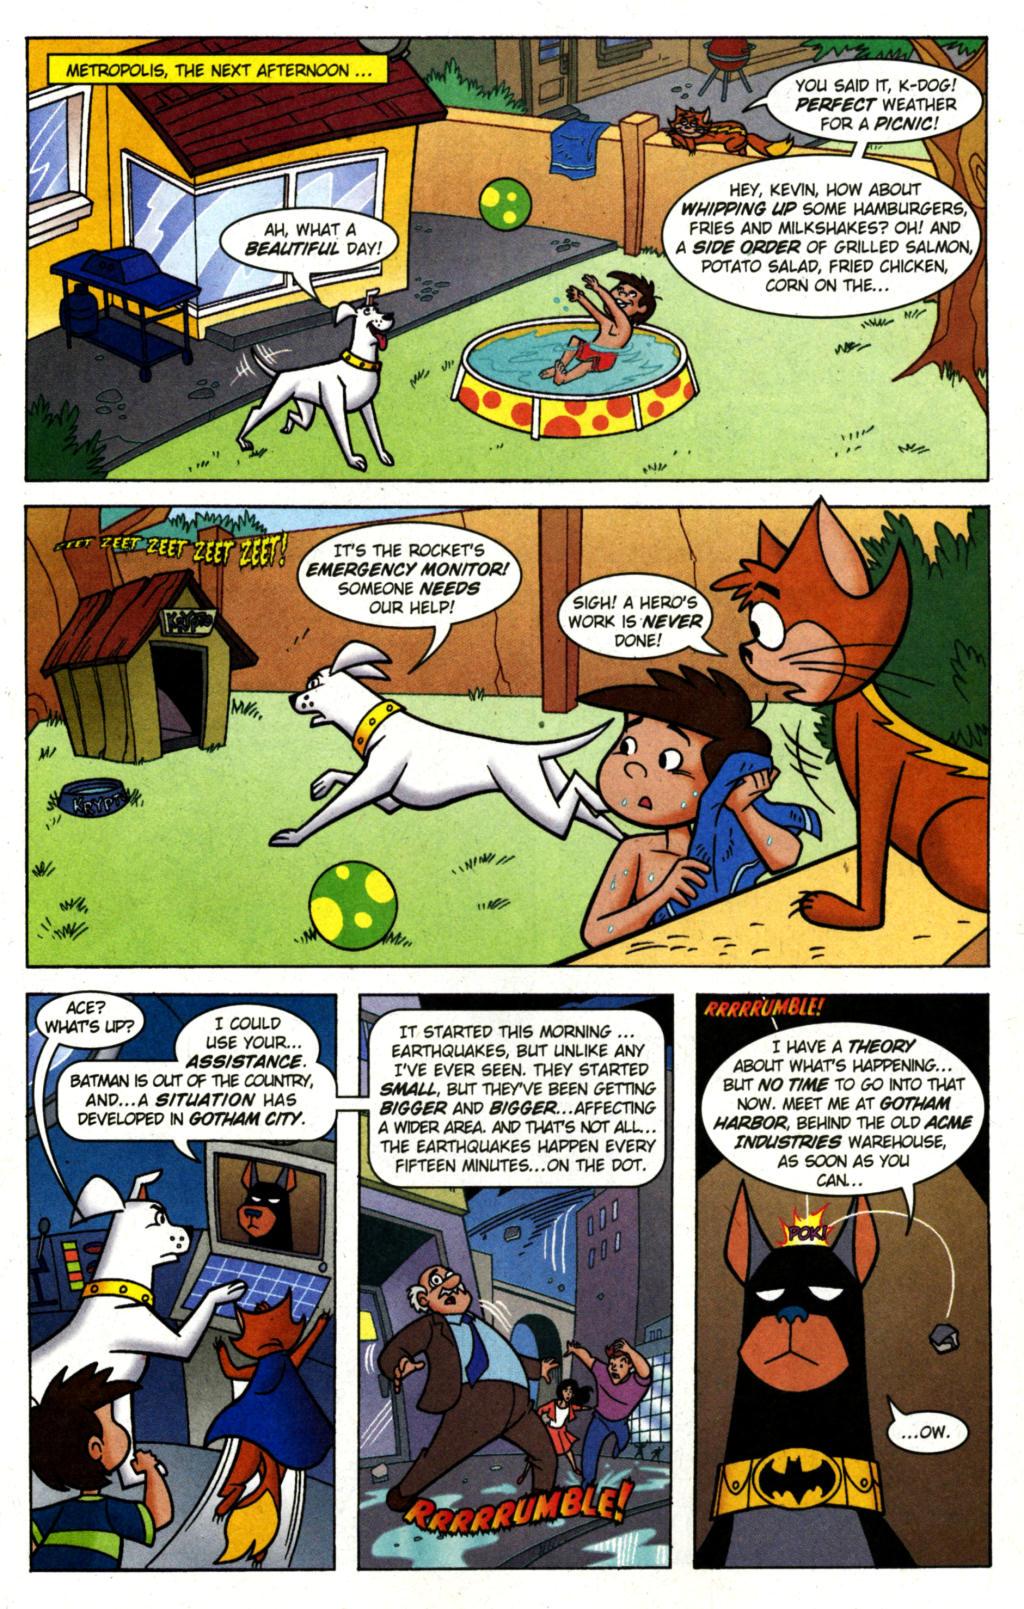 Read online Krypto the Superdog comic -  Issue #1 - 14